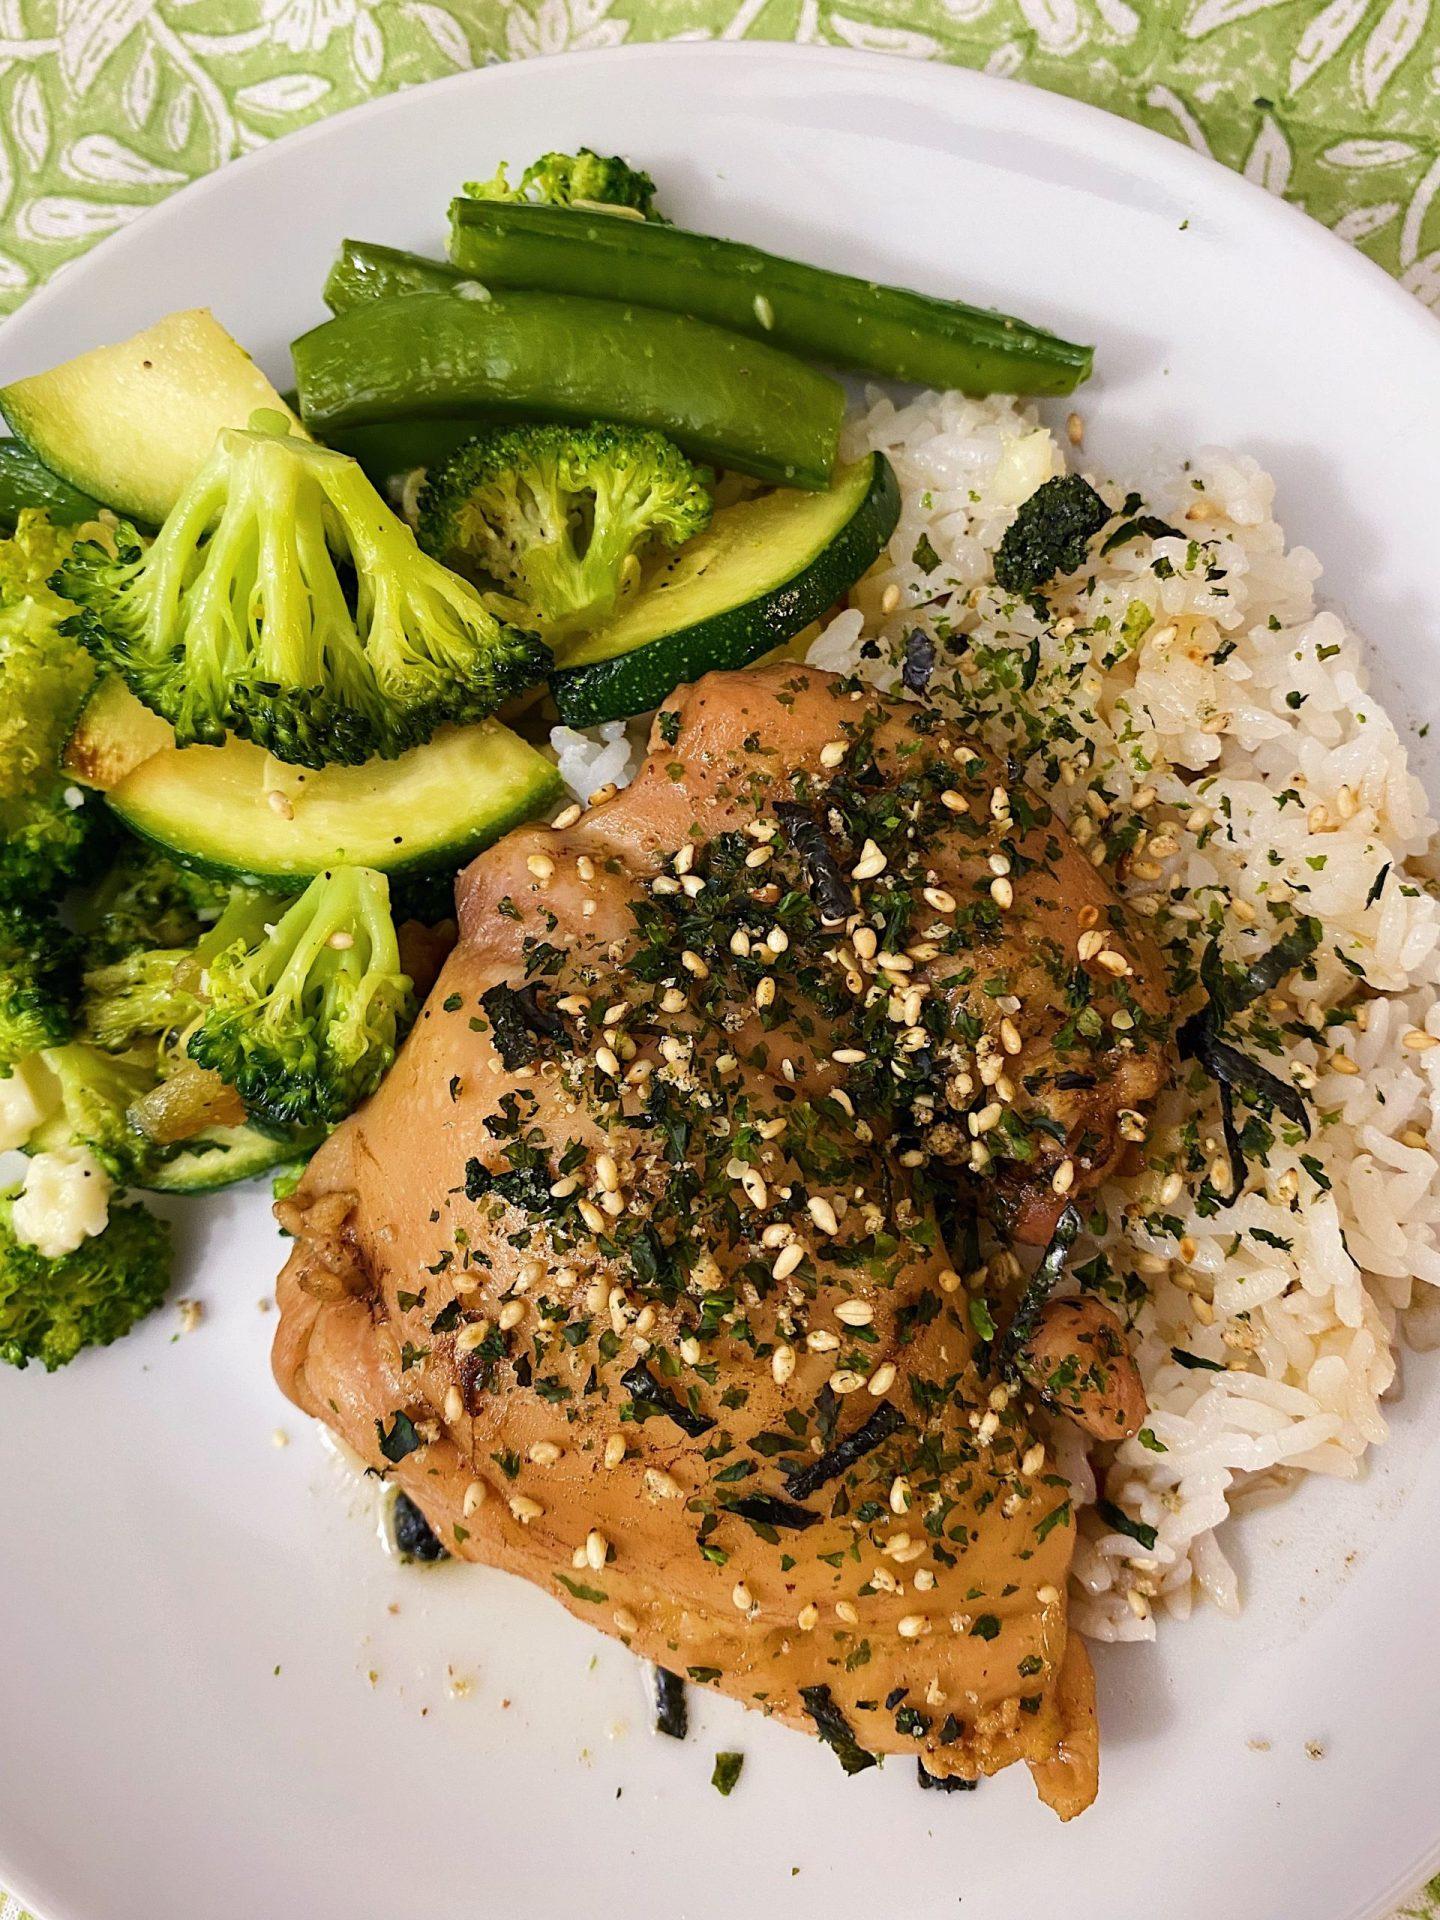 Shoyu chicken and stir fry veggies